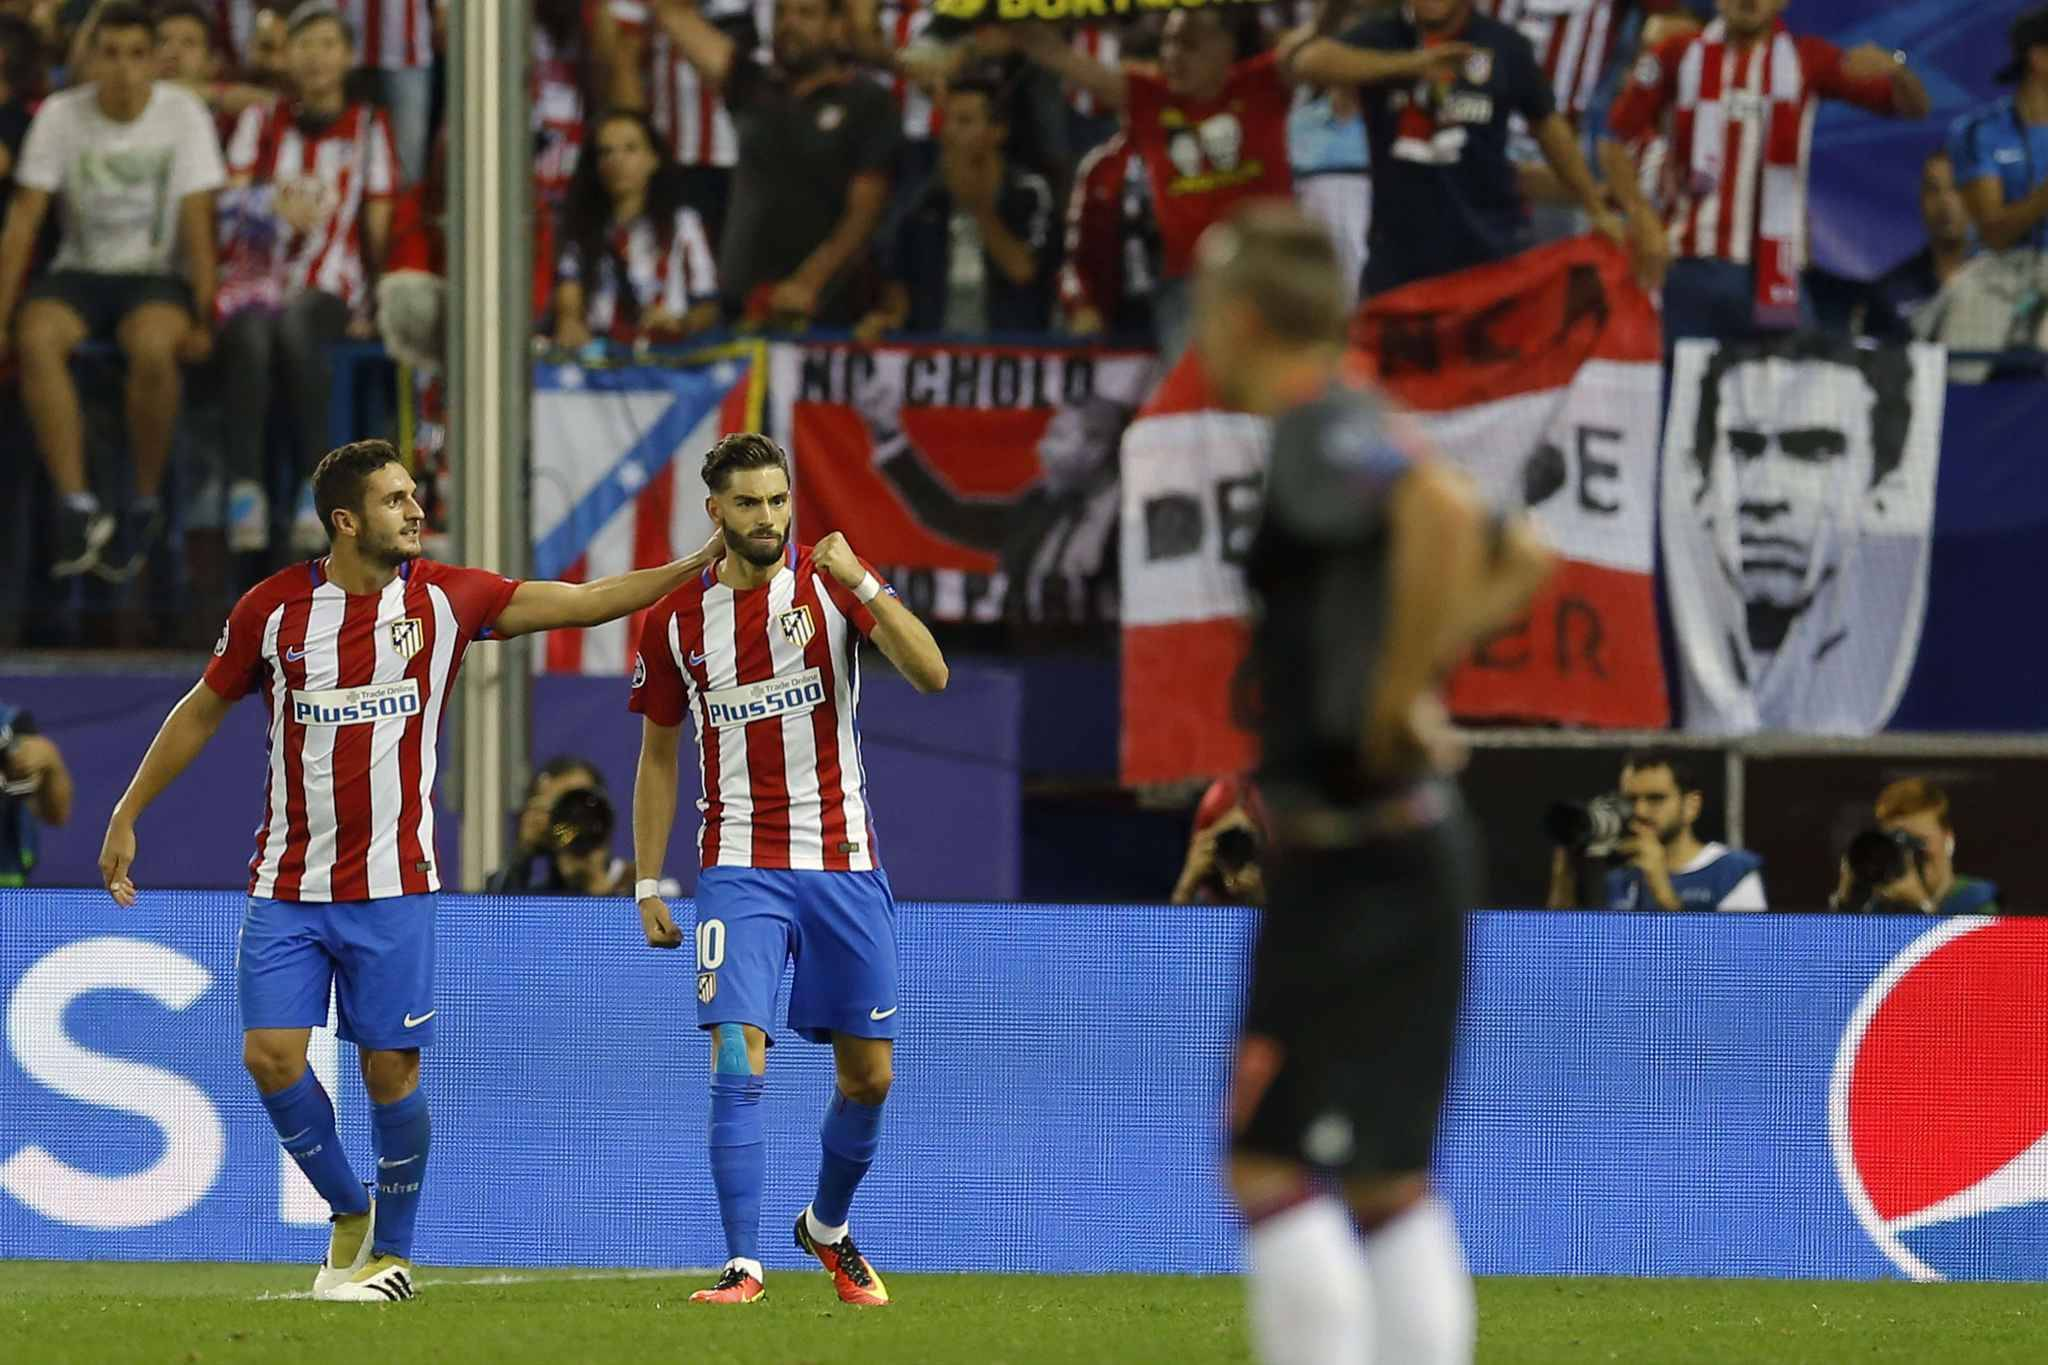 sport football  video ligue champions carrasco heros enorme atletico bayern grizou rate peno